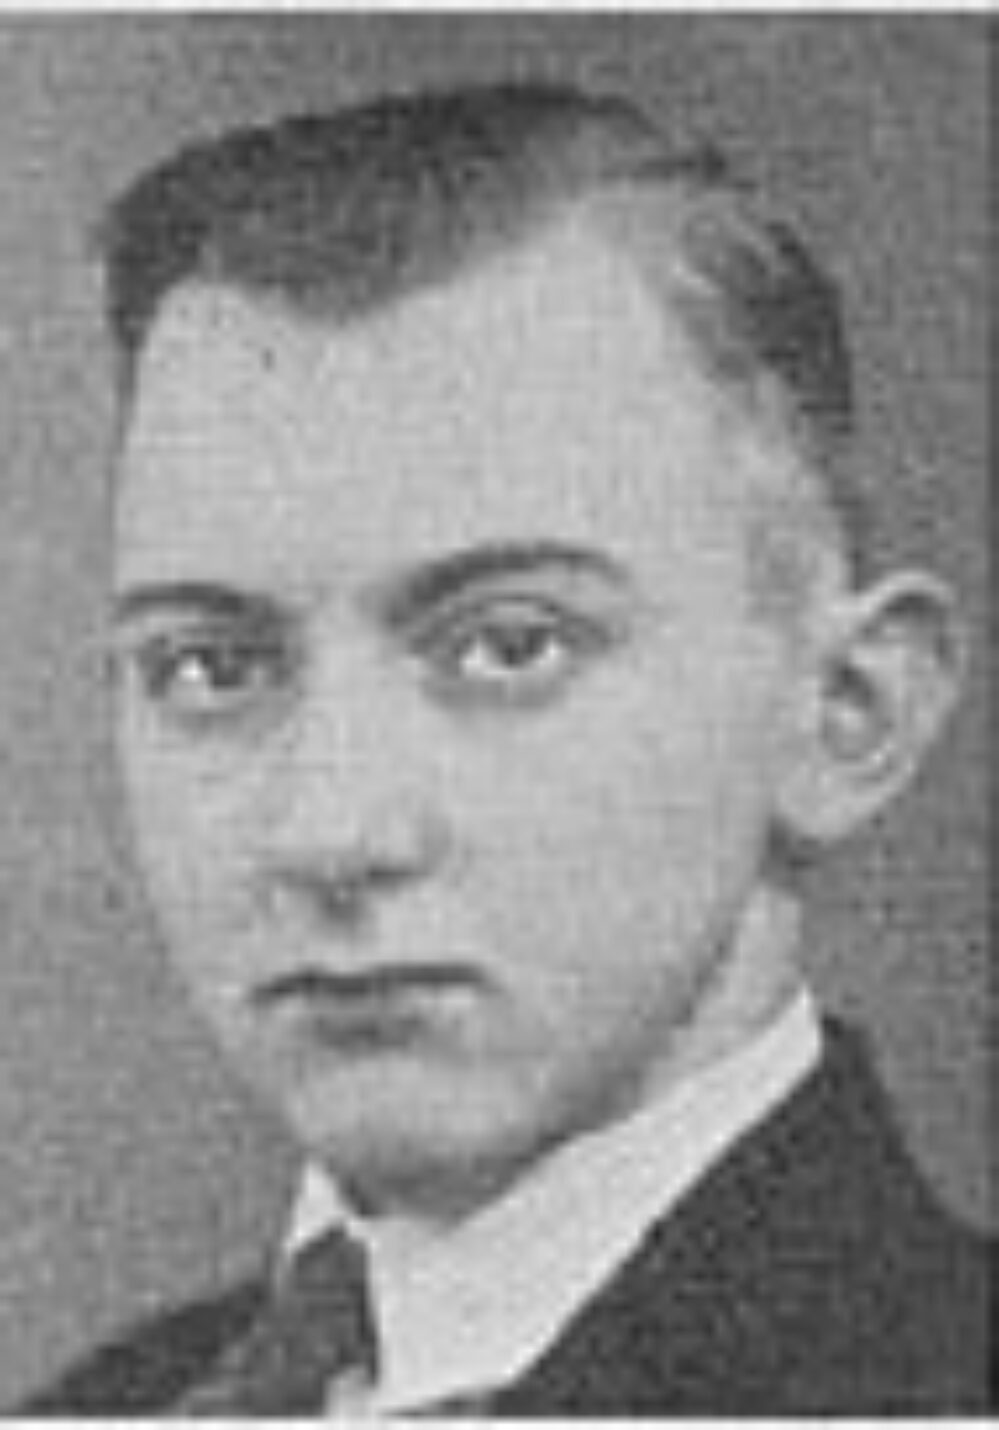 Hjalmar Bernhard Myklestad